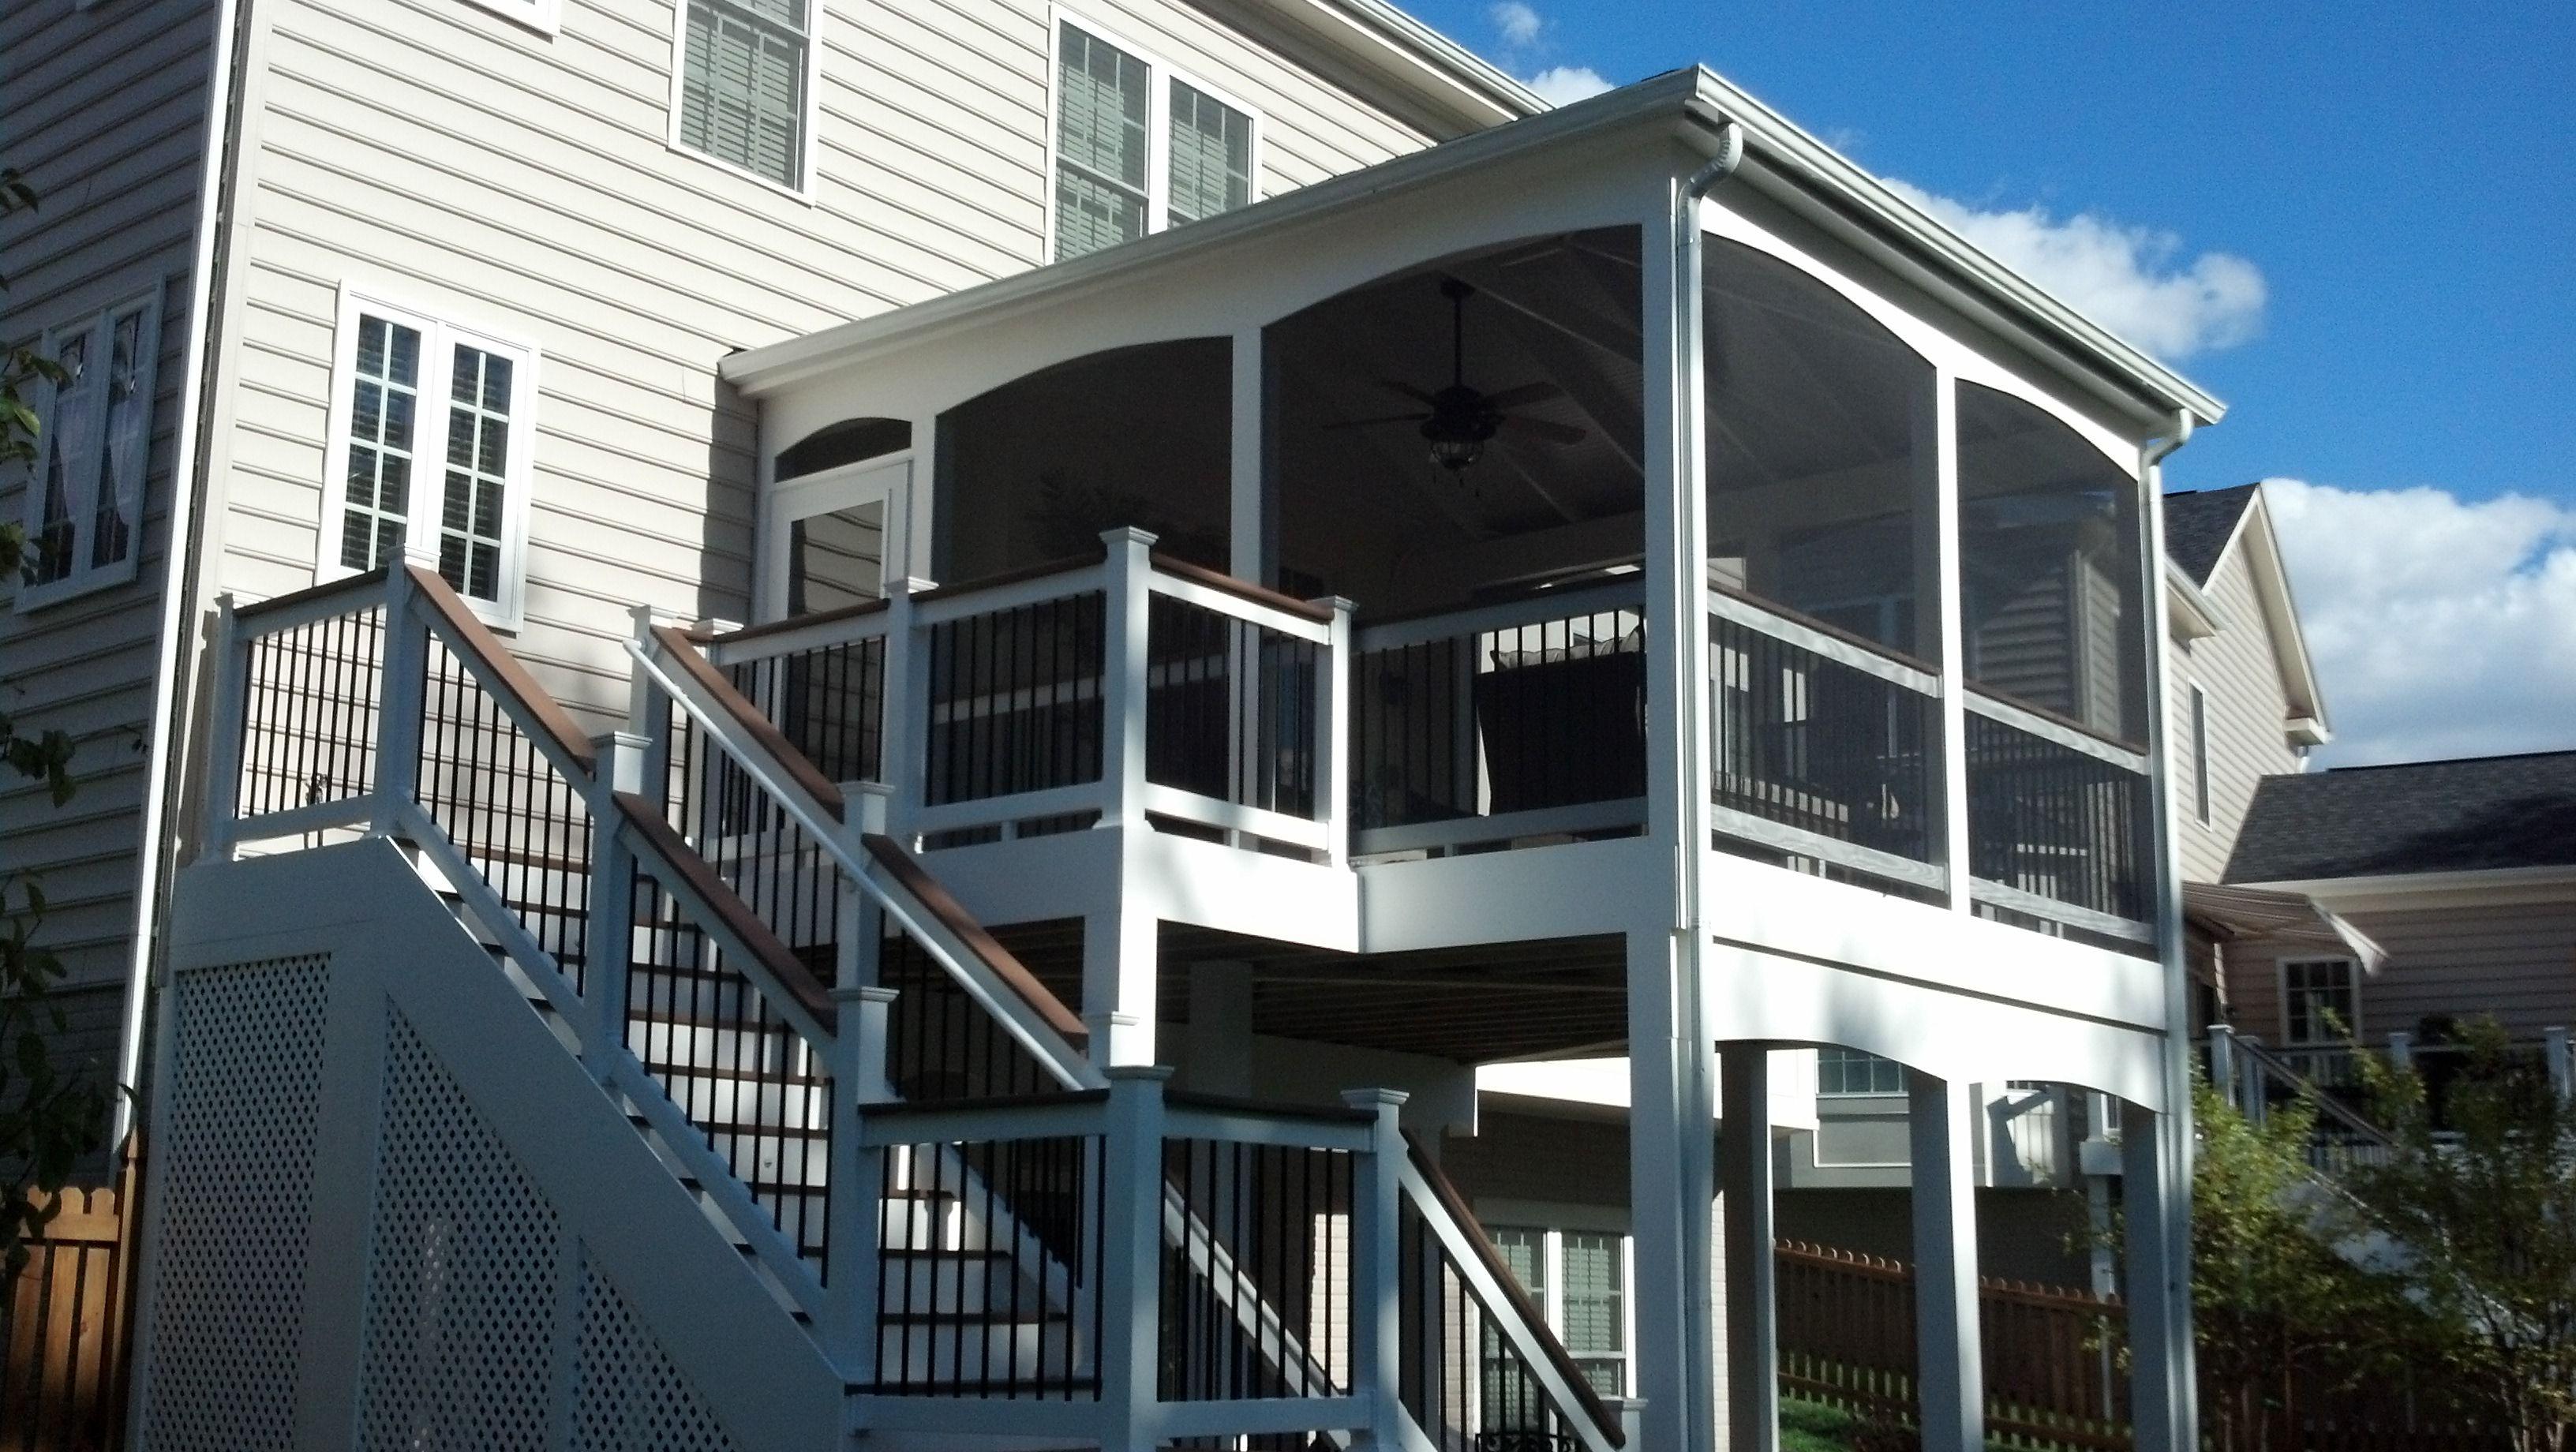 Screened Porch Open Deck Combo White Vinyl Rail System Black Aluminum Balusters Composite Decking White Vi Vinyl Railing Aluminum Balusters Screened Porch